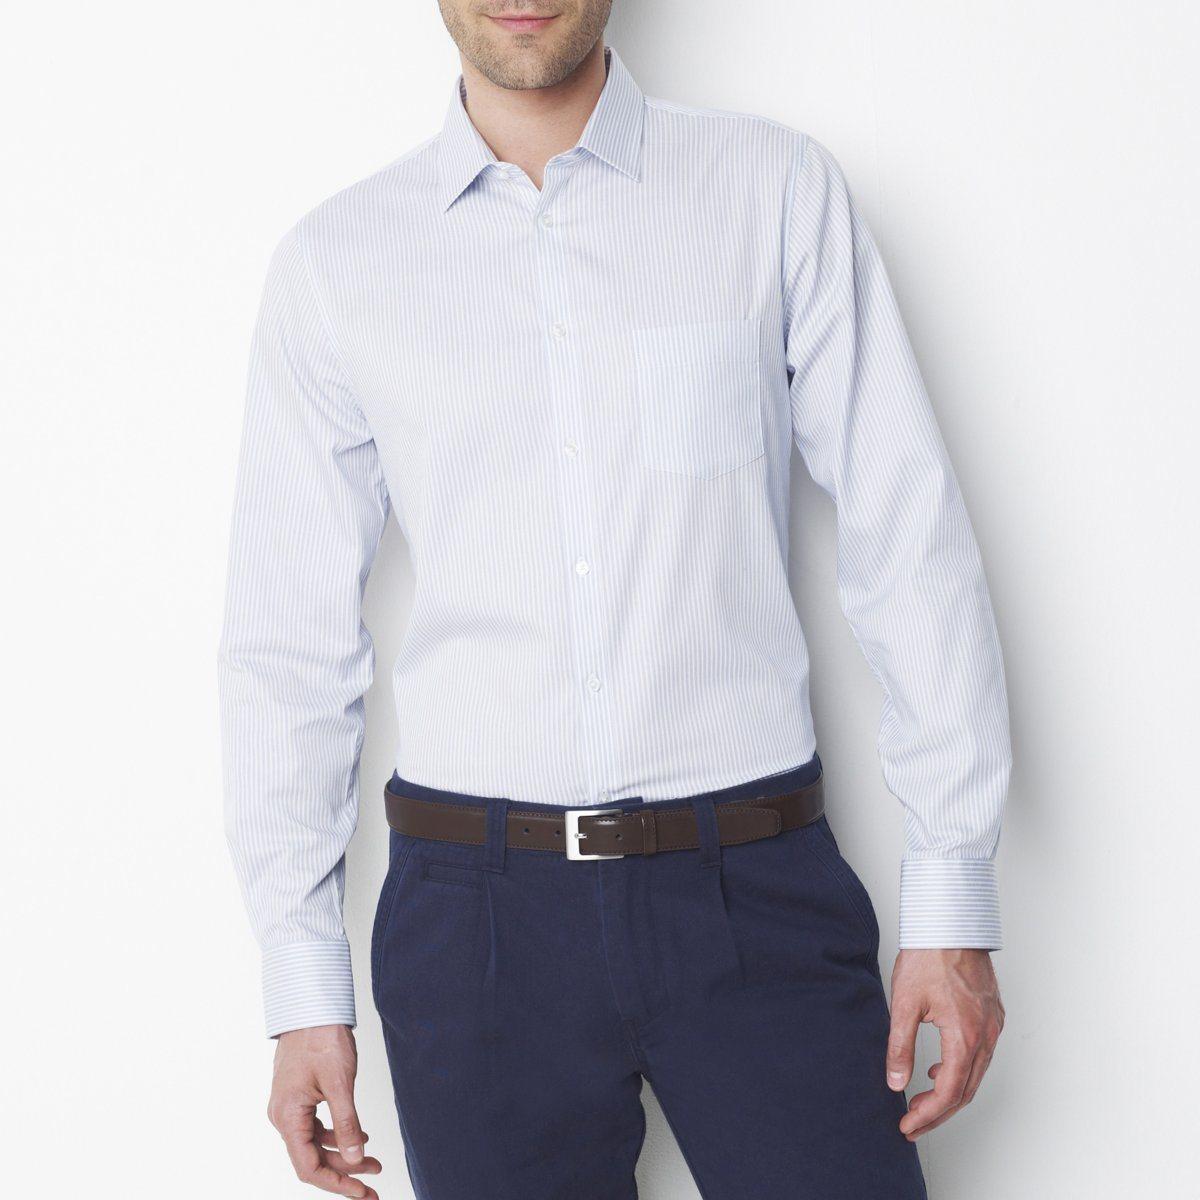 e46c5f5ef0f ... Мужская серо-белая рубашка в полоску с синими брюками ...